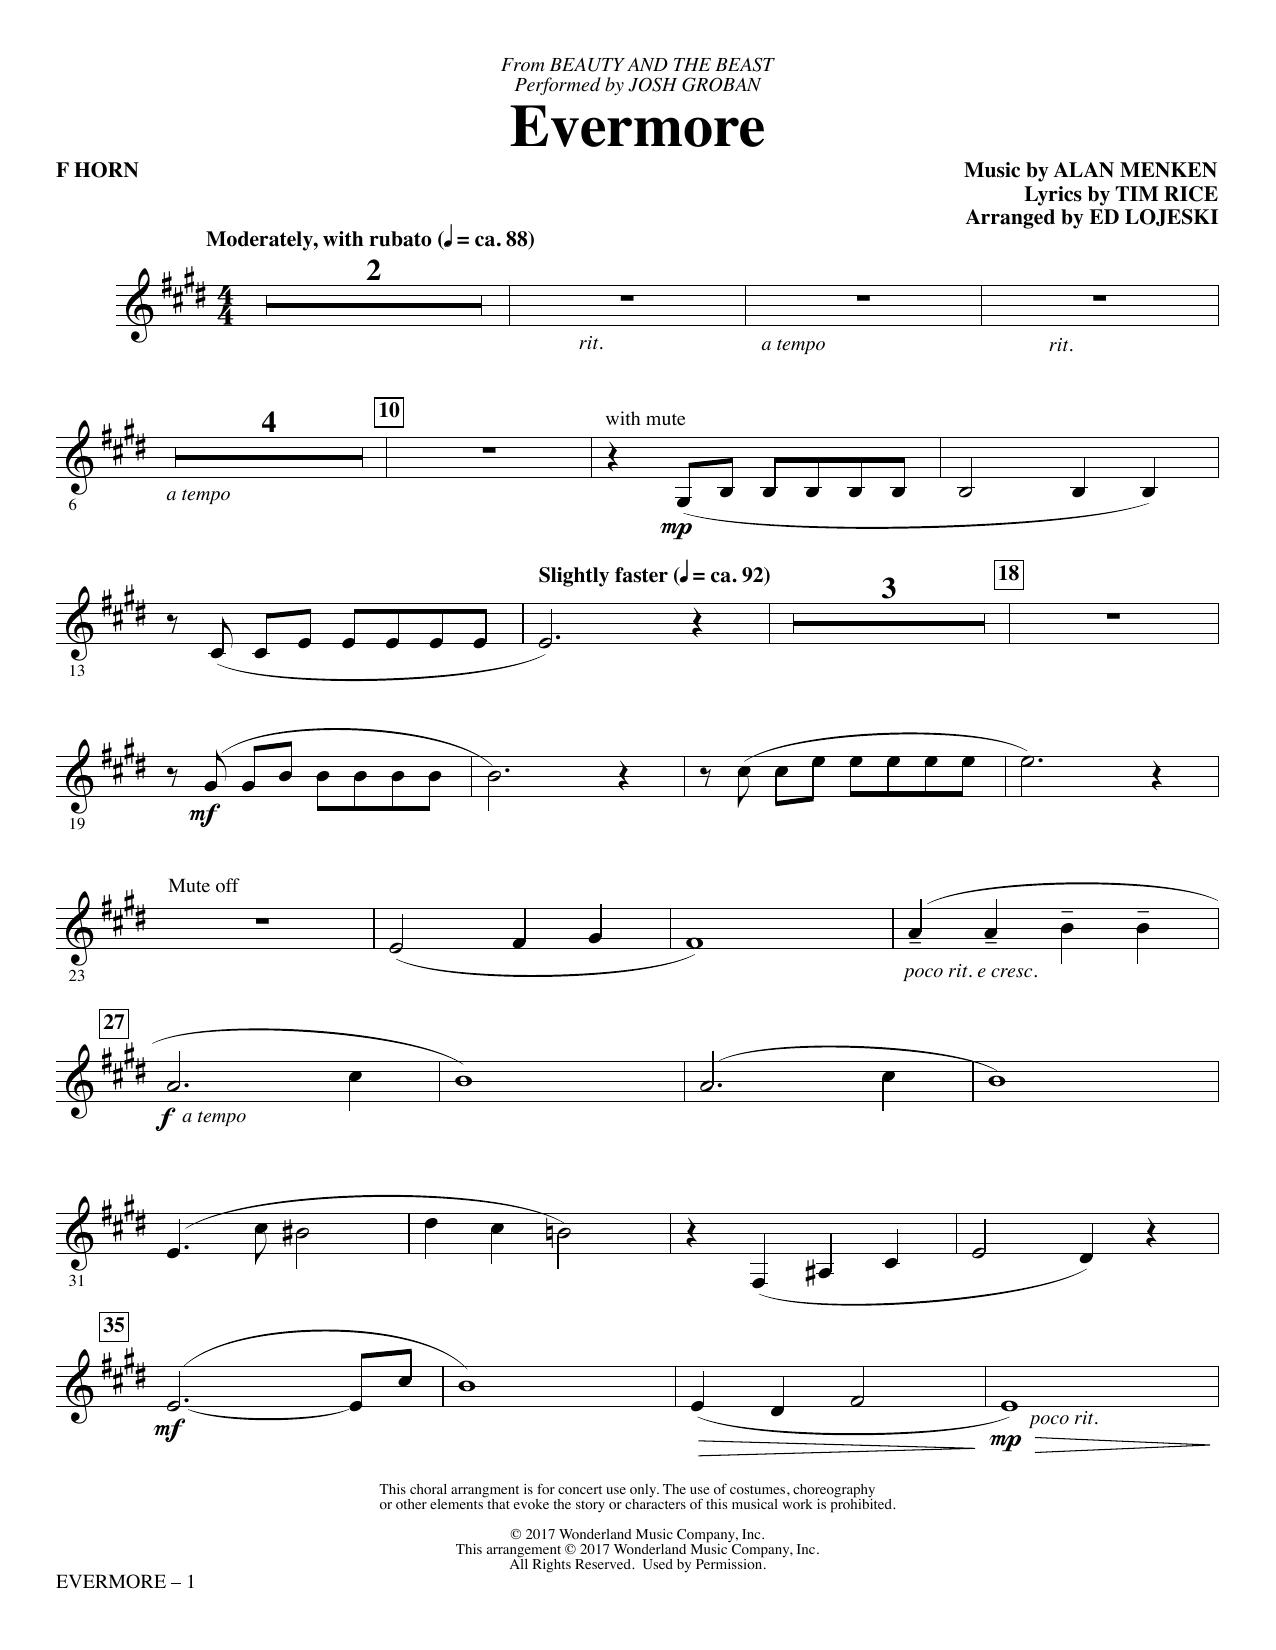 Josh Groban - Evermore - F Horn